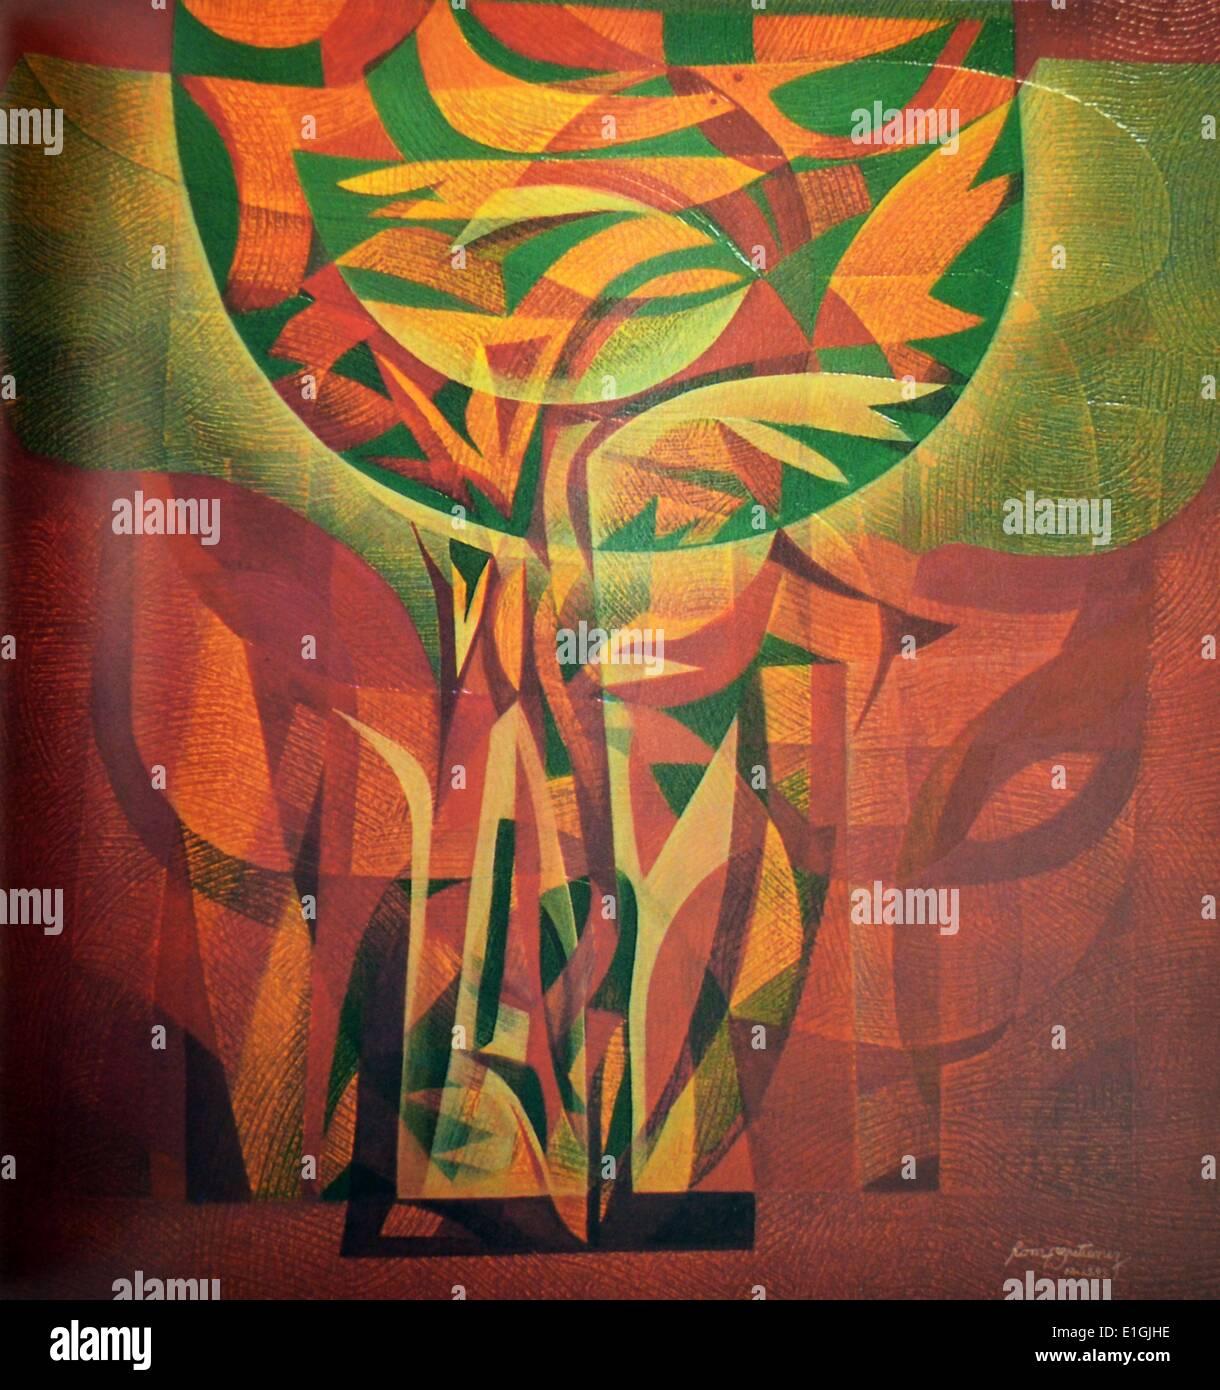 Romeo E Gutierrez, Tree of Life, 1993, Oil on canvas. - Stock Image